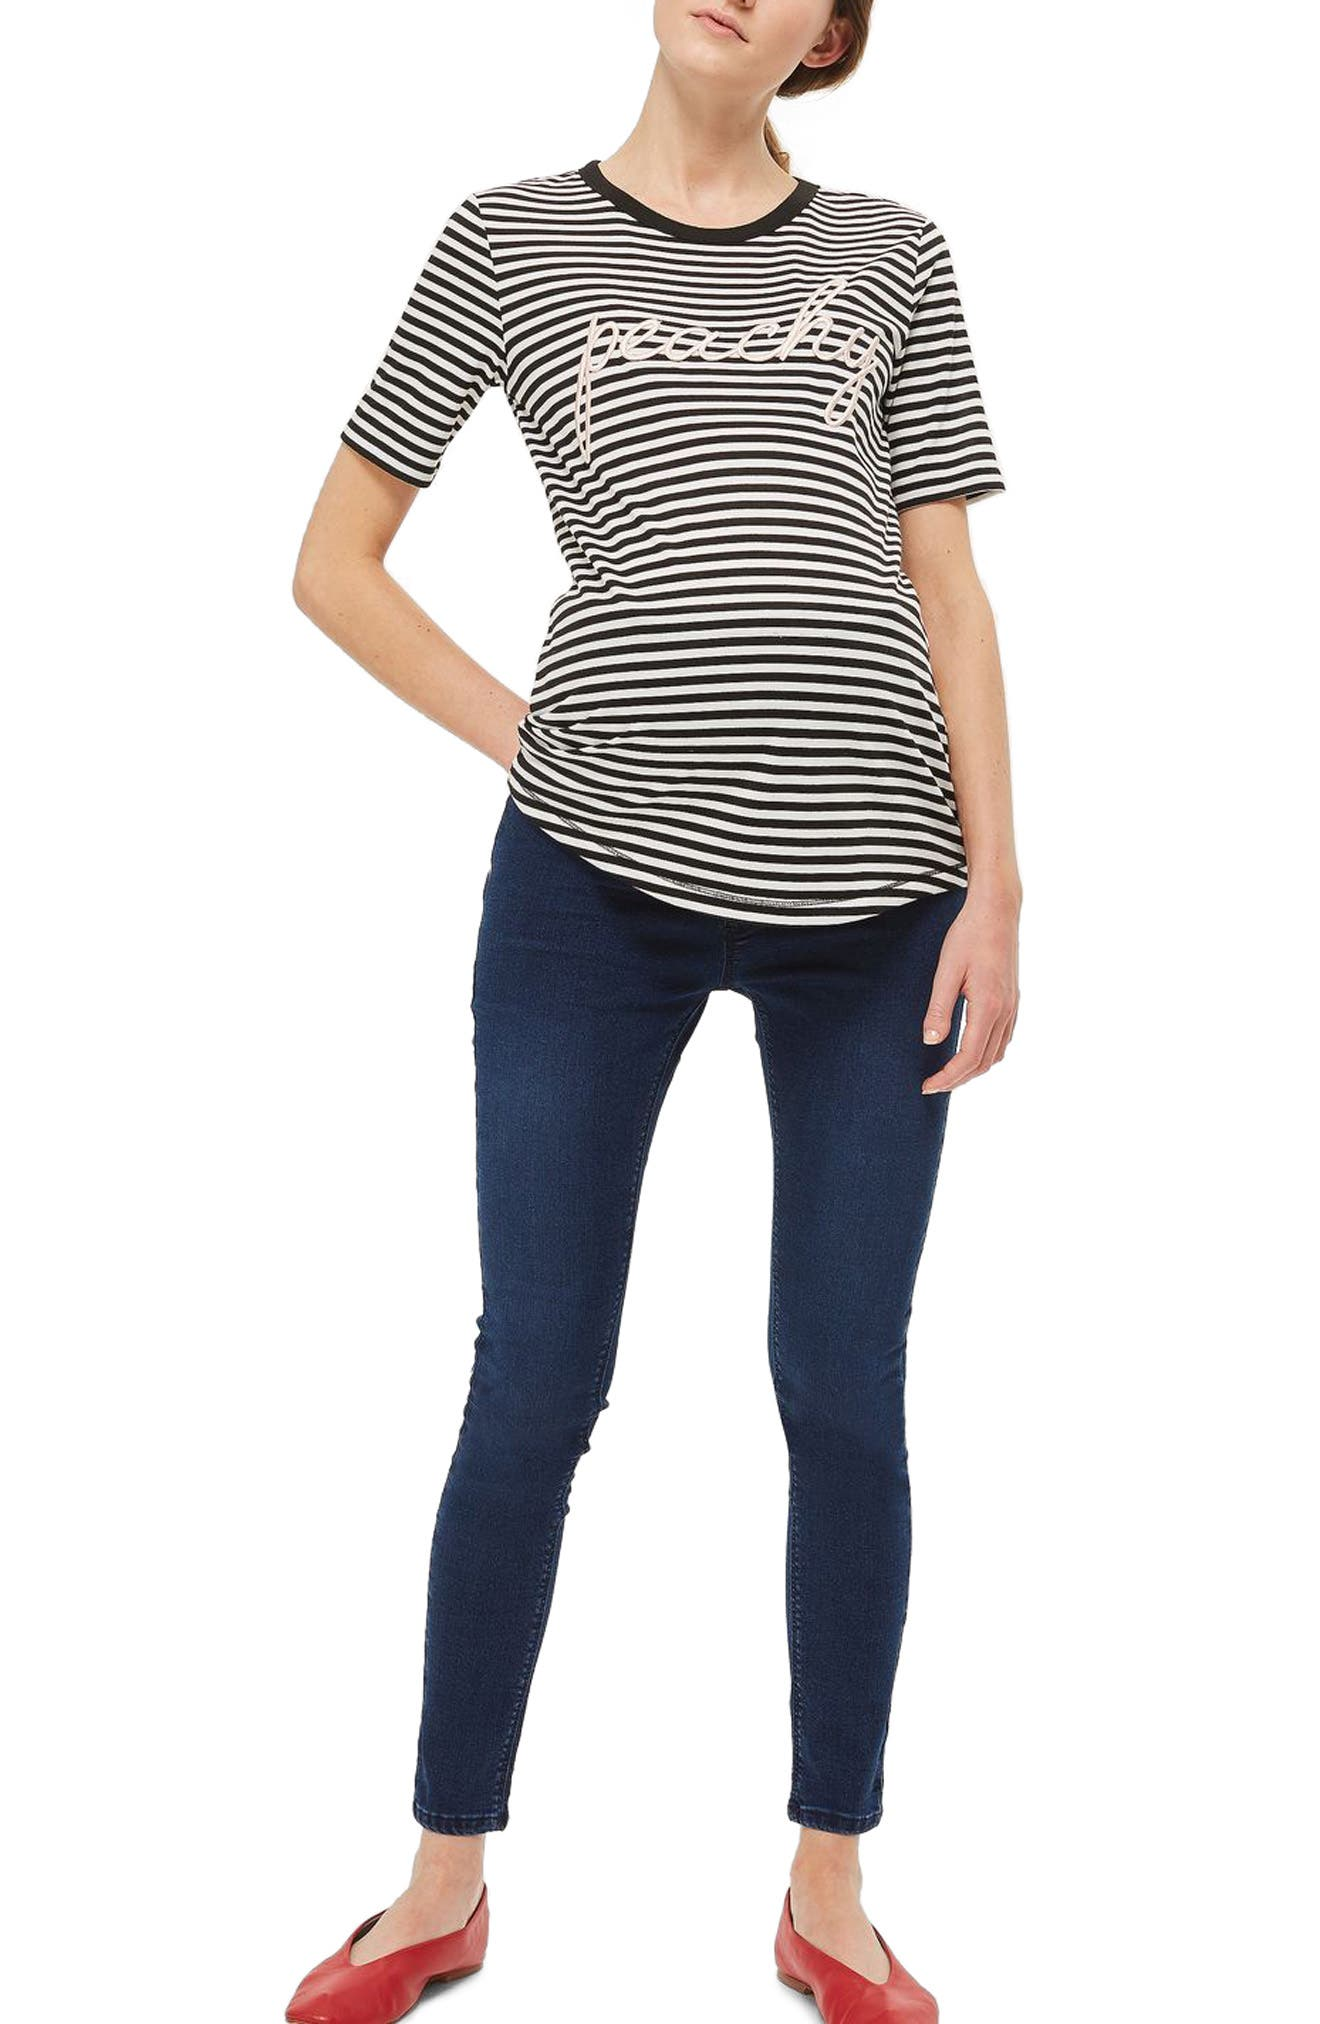 Maternity Clothes: Dresses, Jeans, Plus Sizes & More | Nordstrom